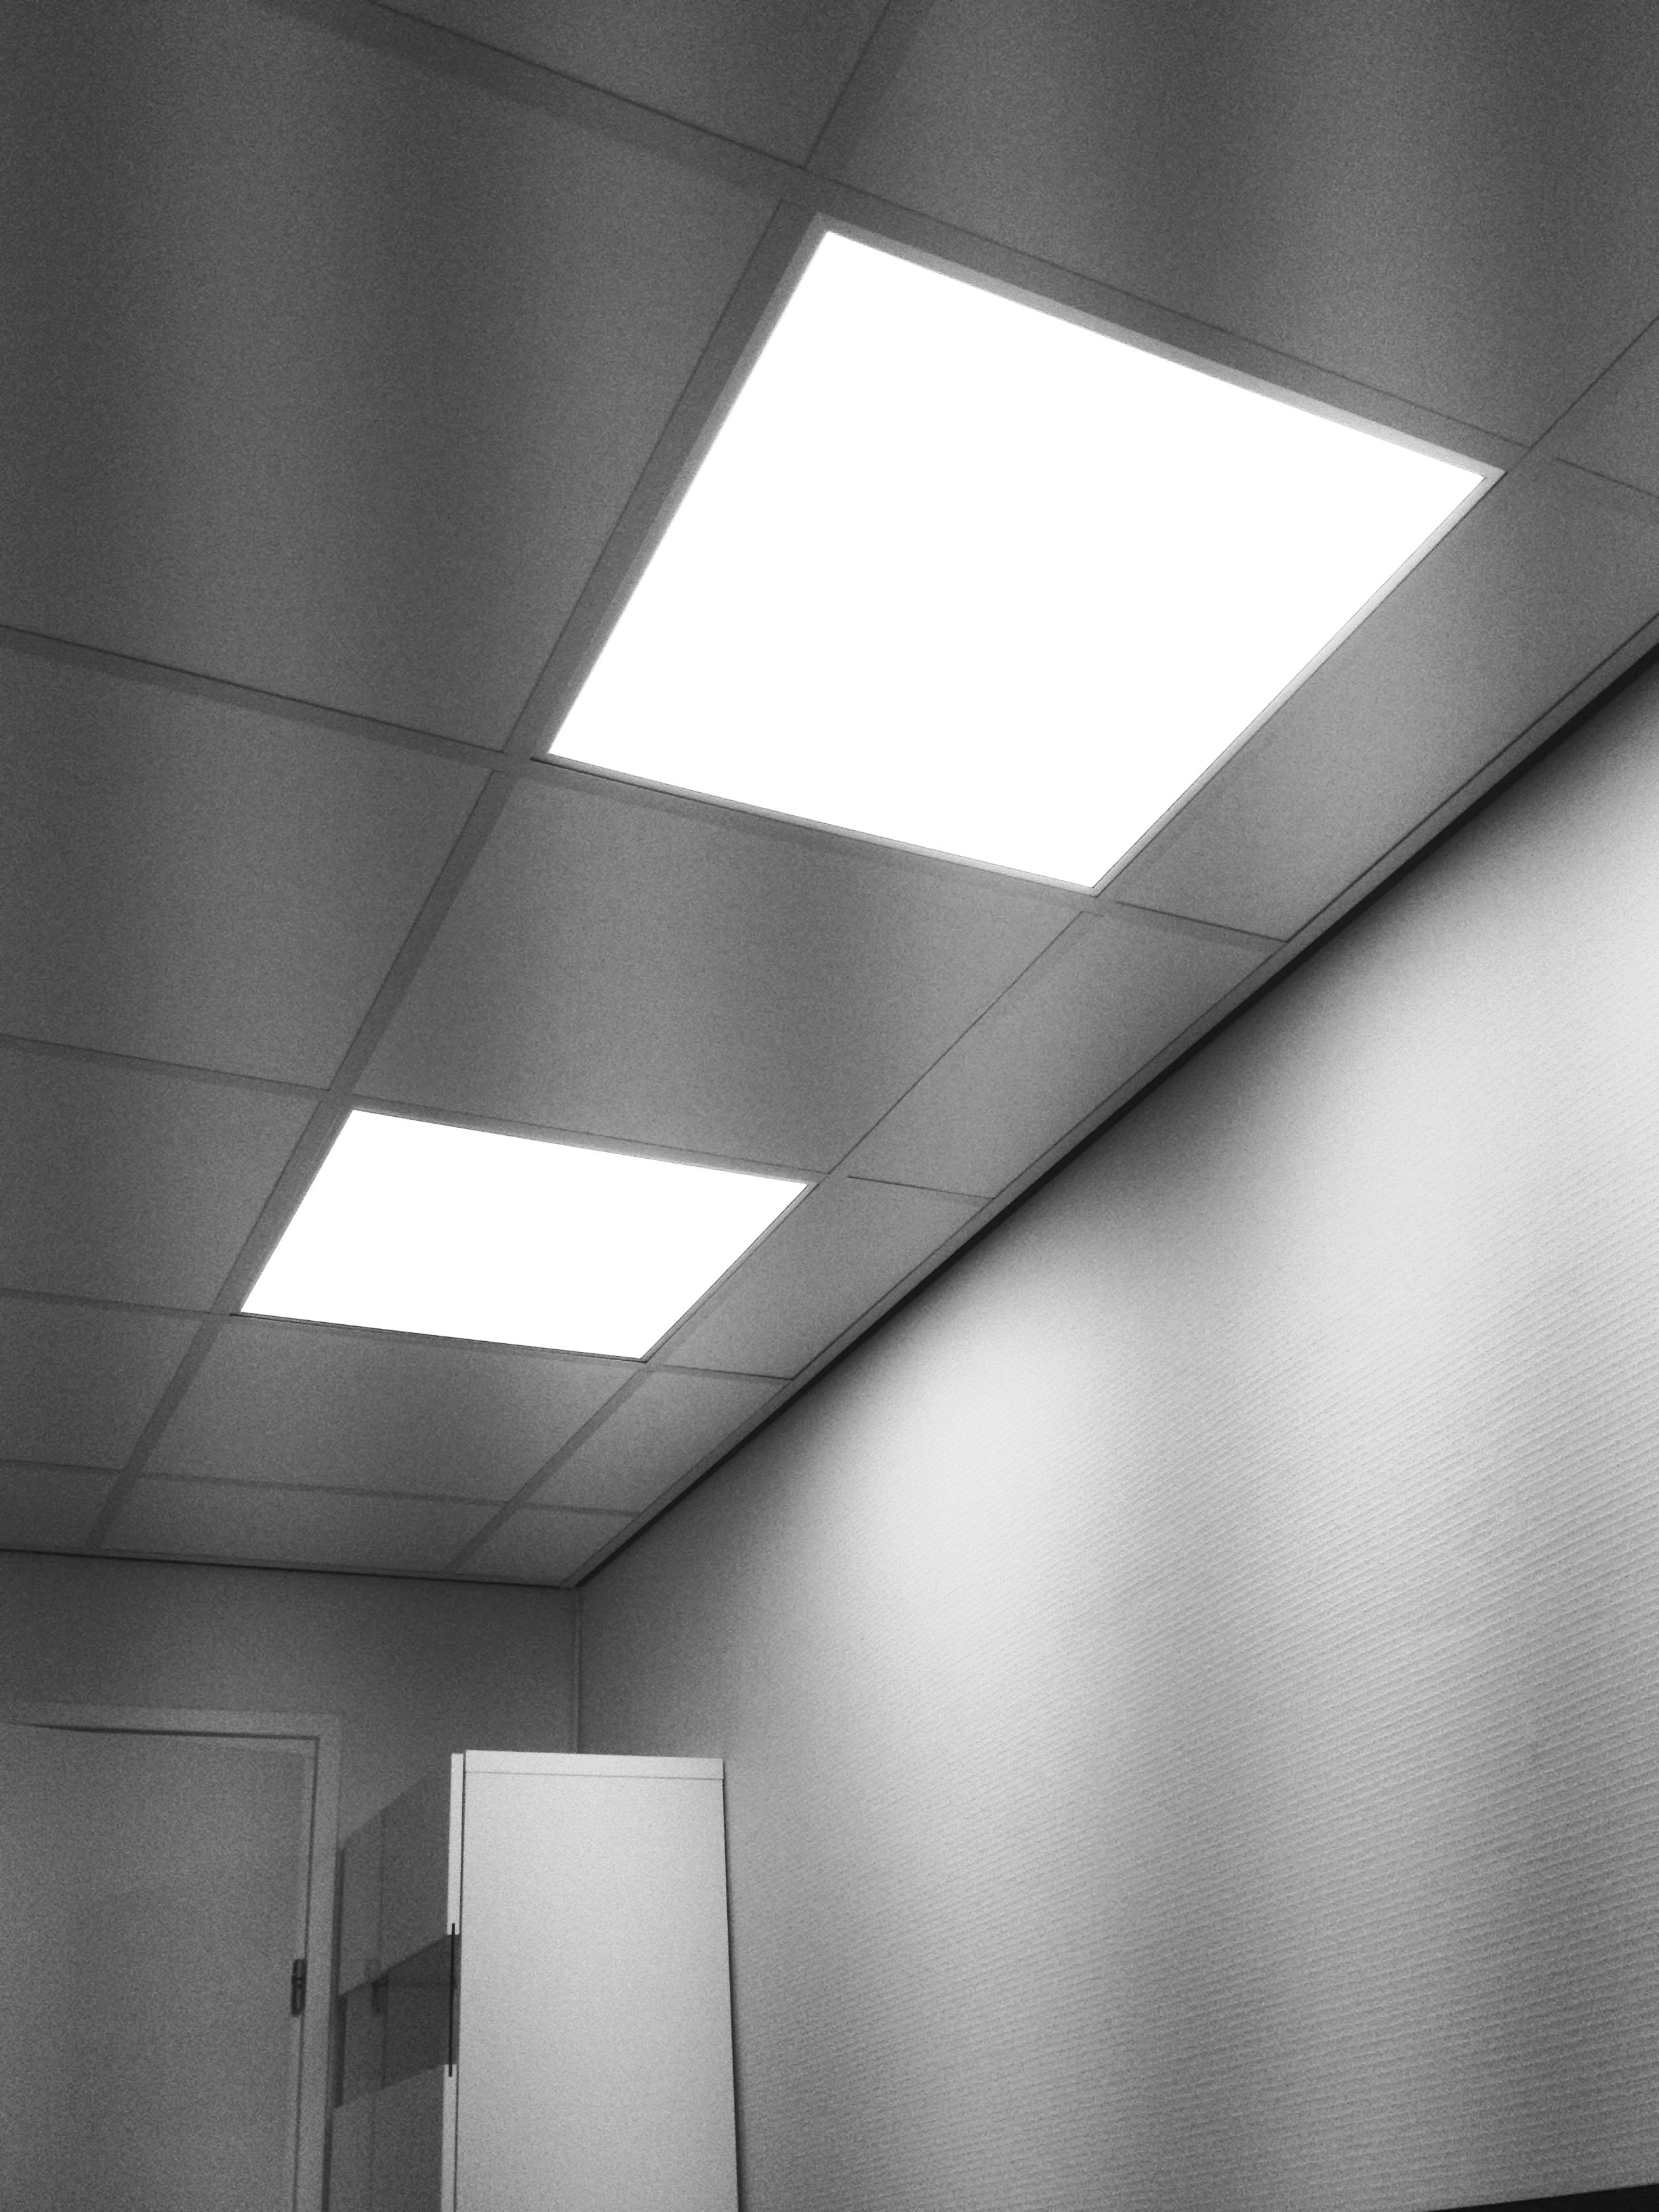 LED paneel, TR 600 x 600 mm, 6000K